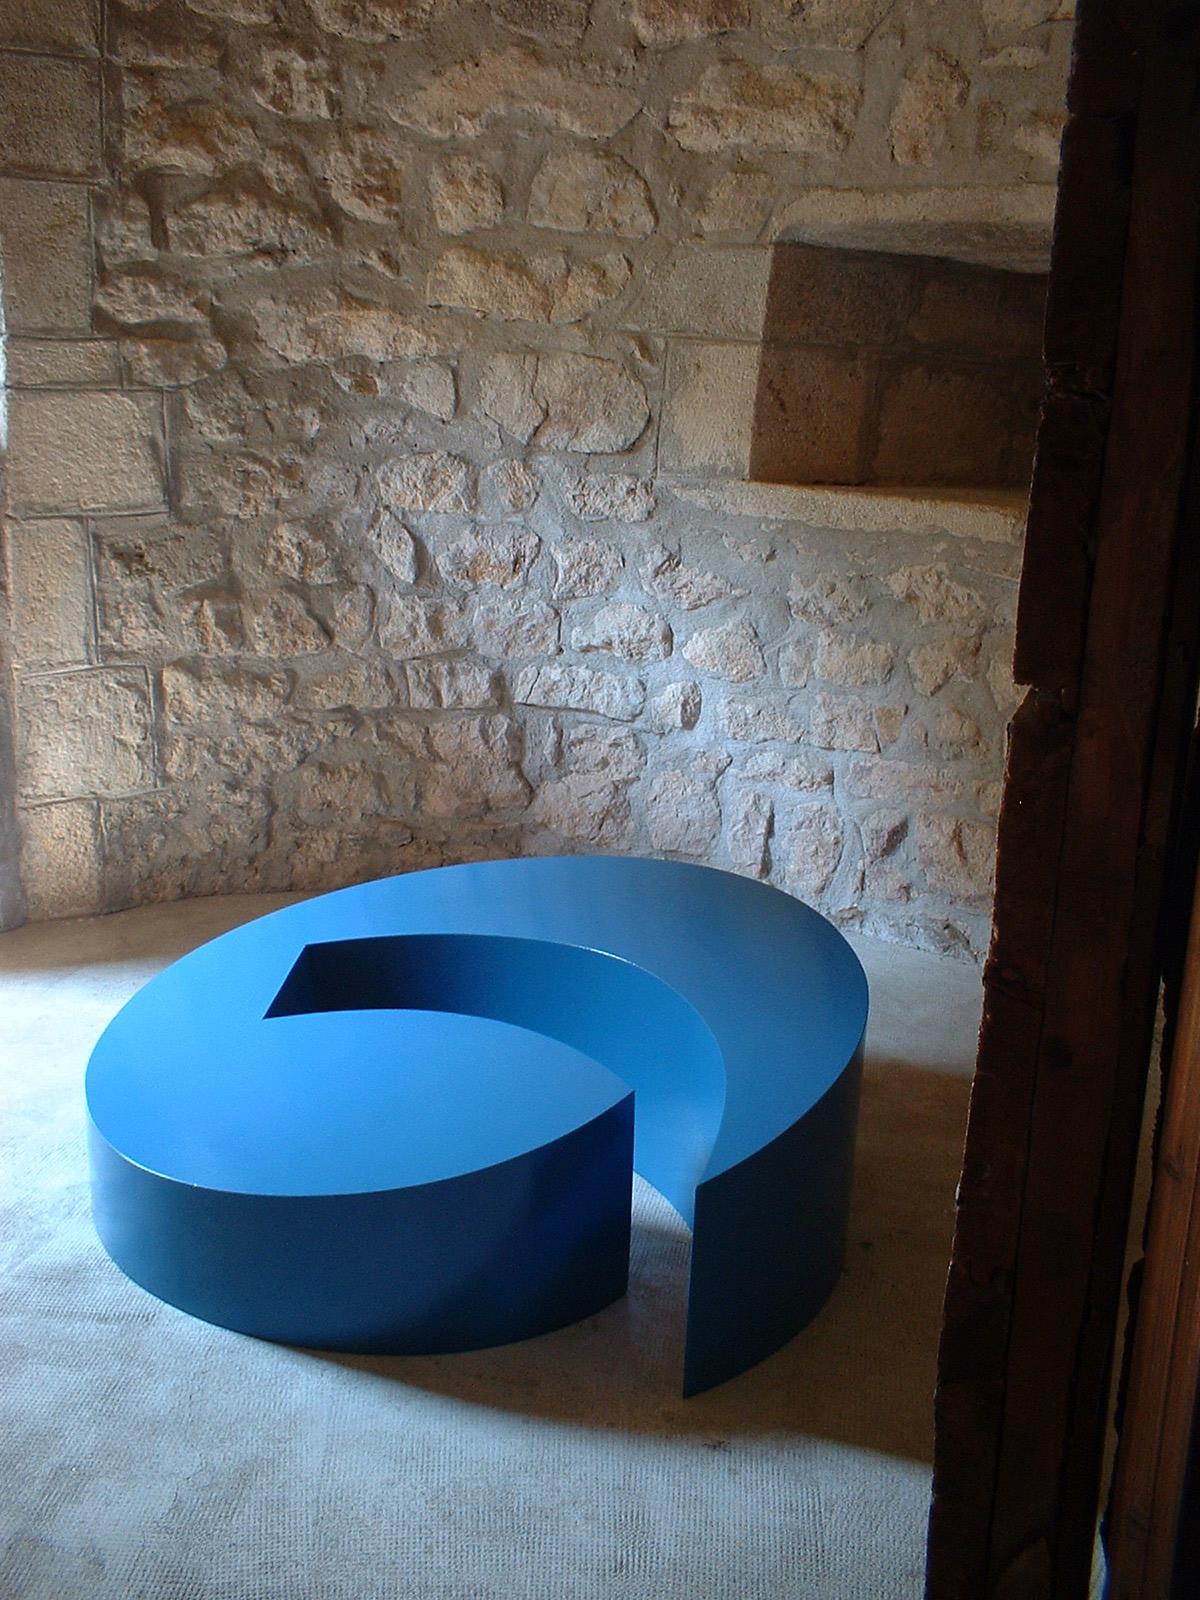 Milos CVACH, sculpture